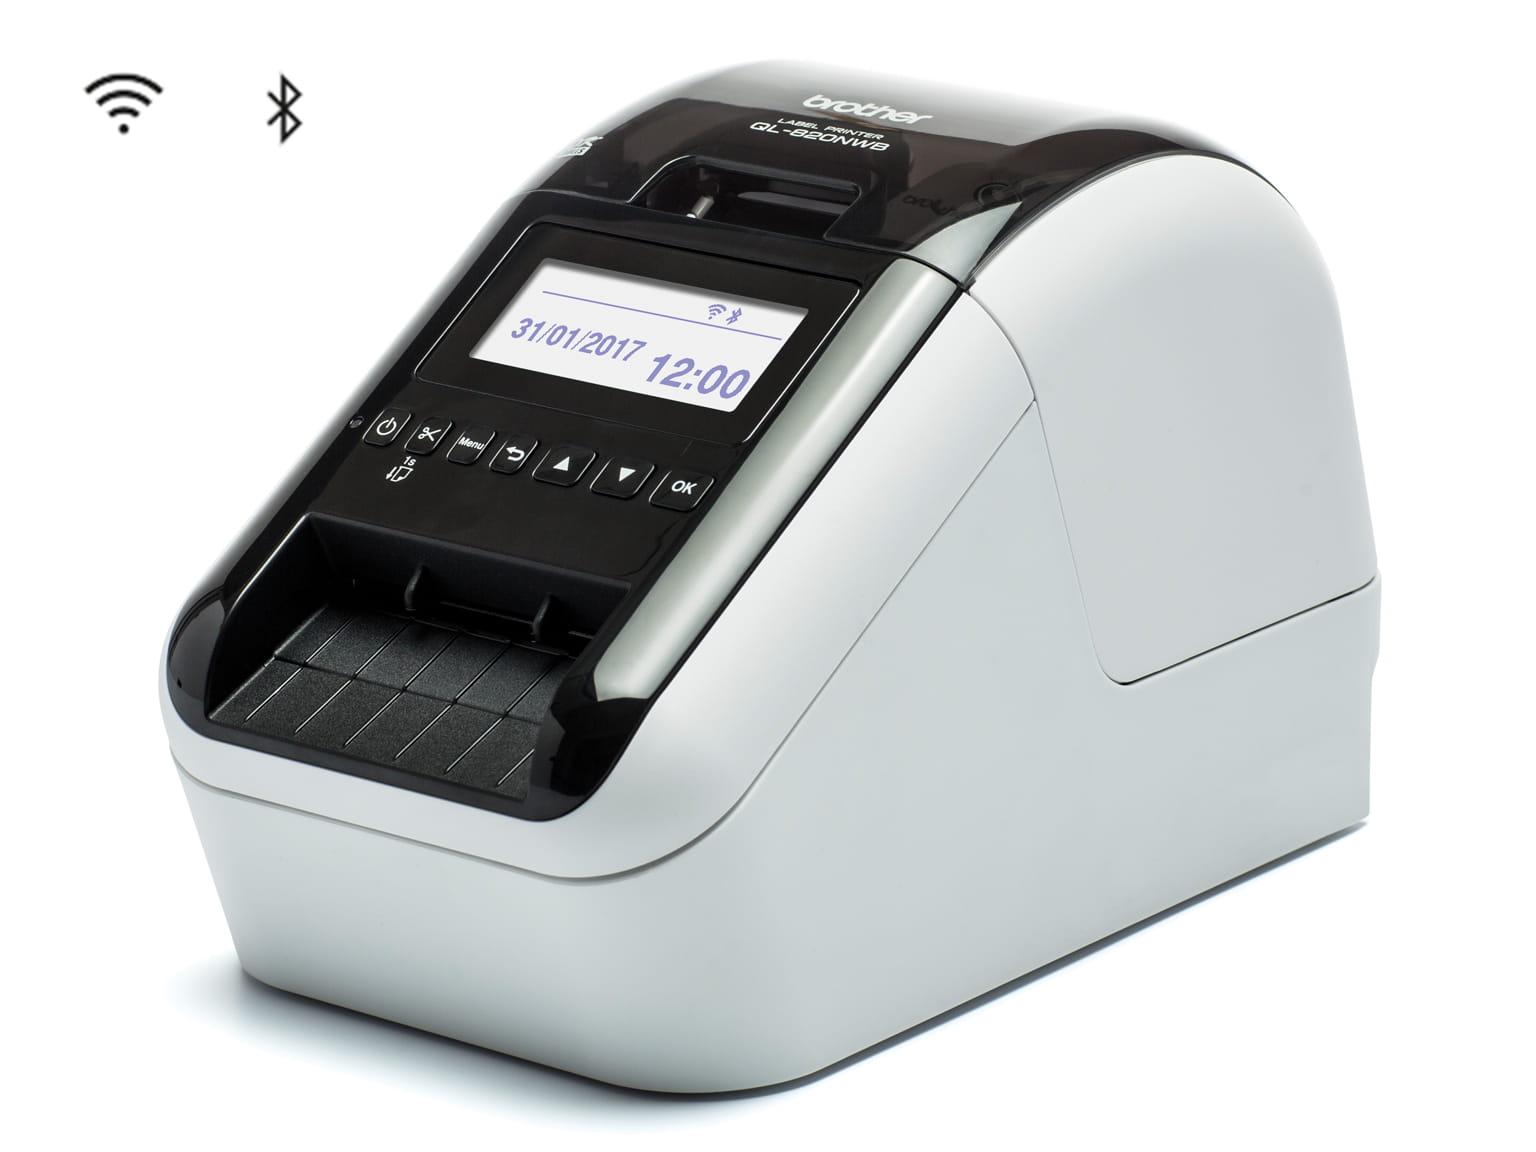 QL-820NWB Brother Label Printer